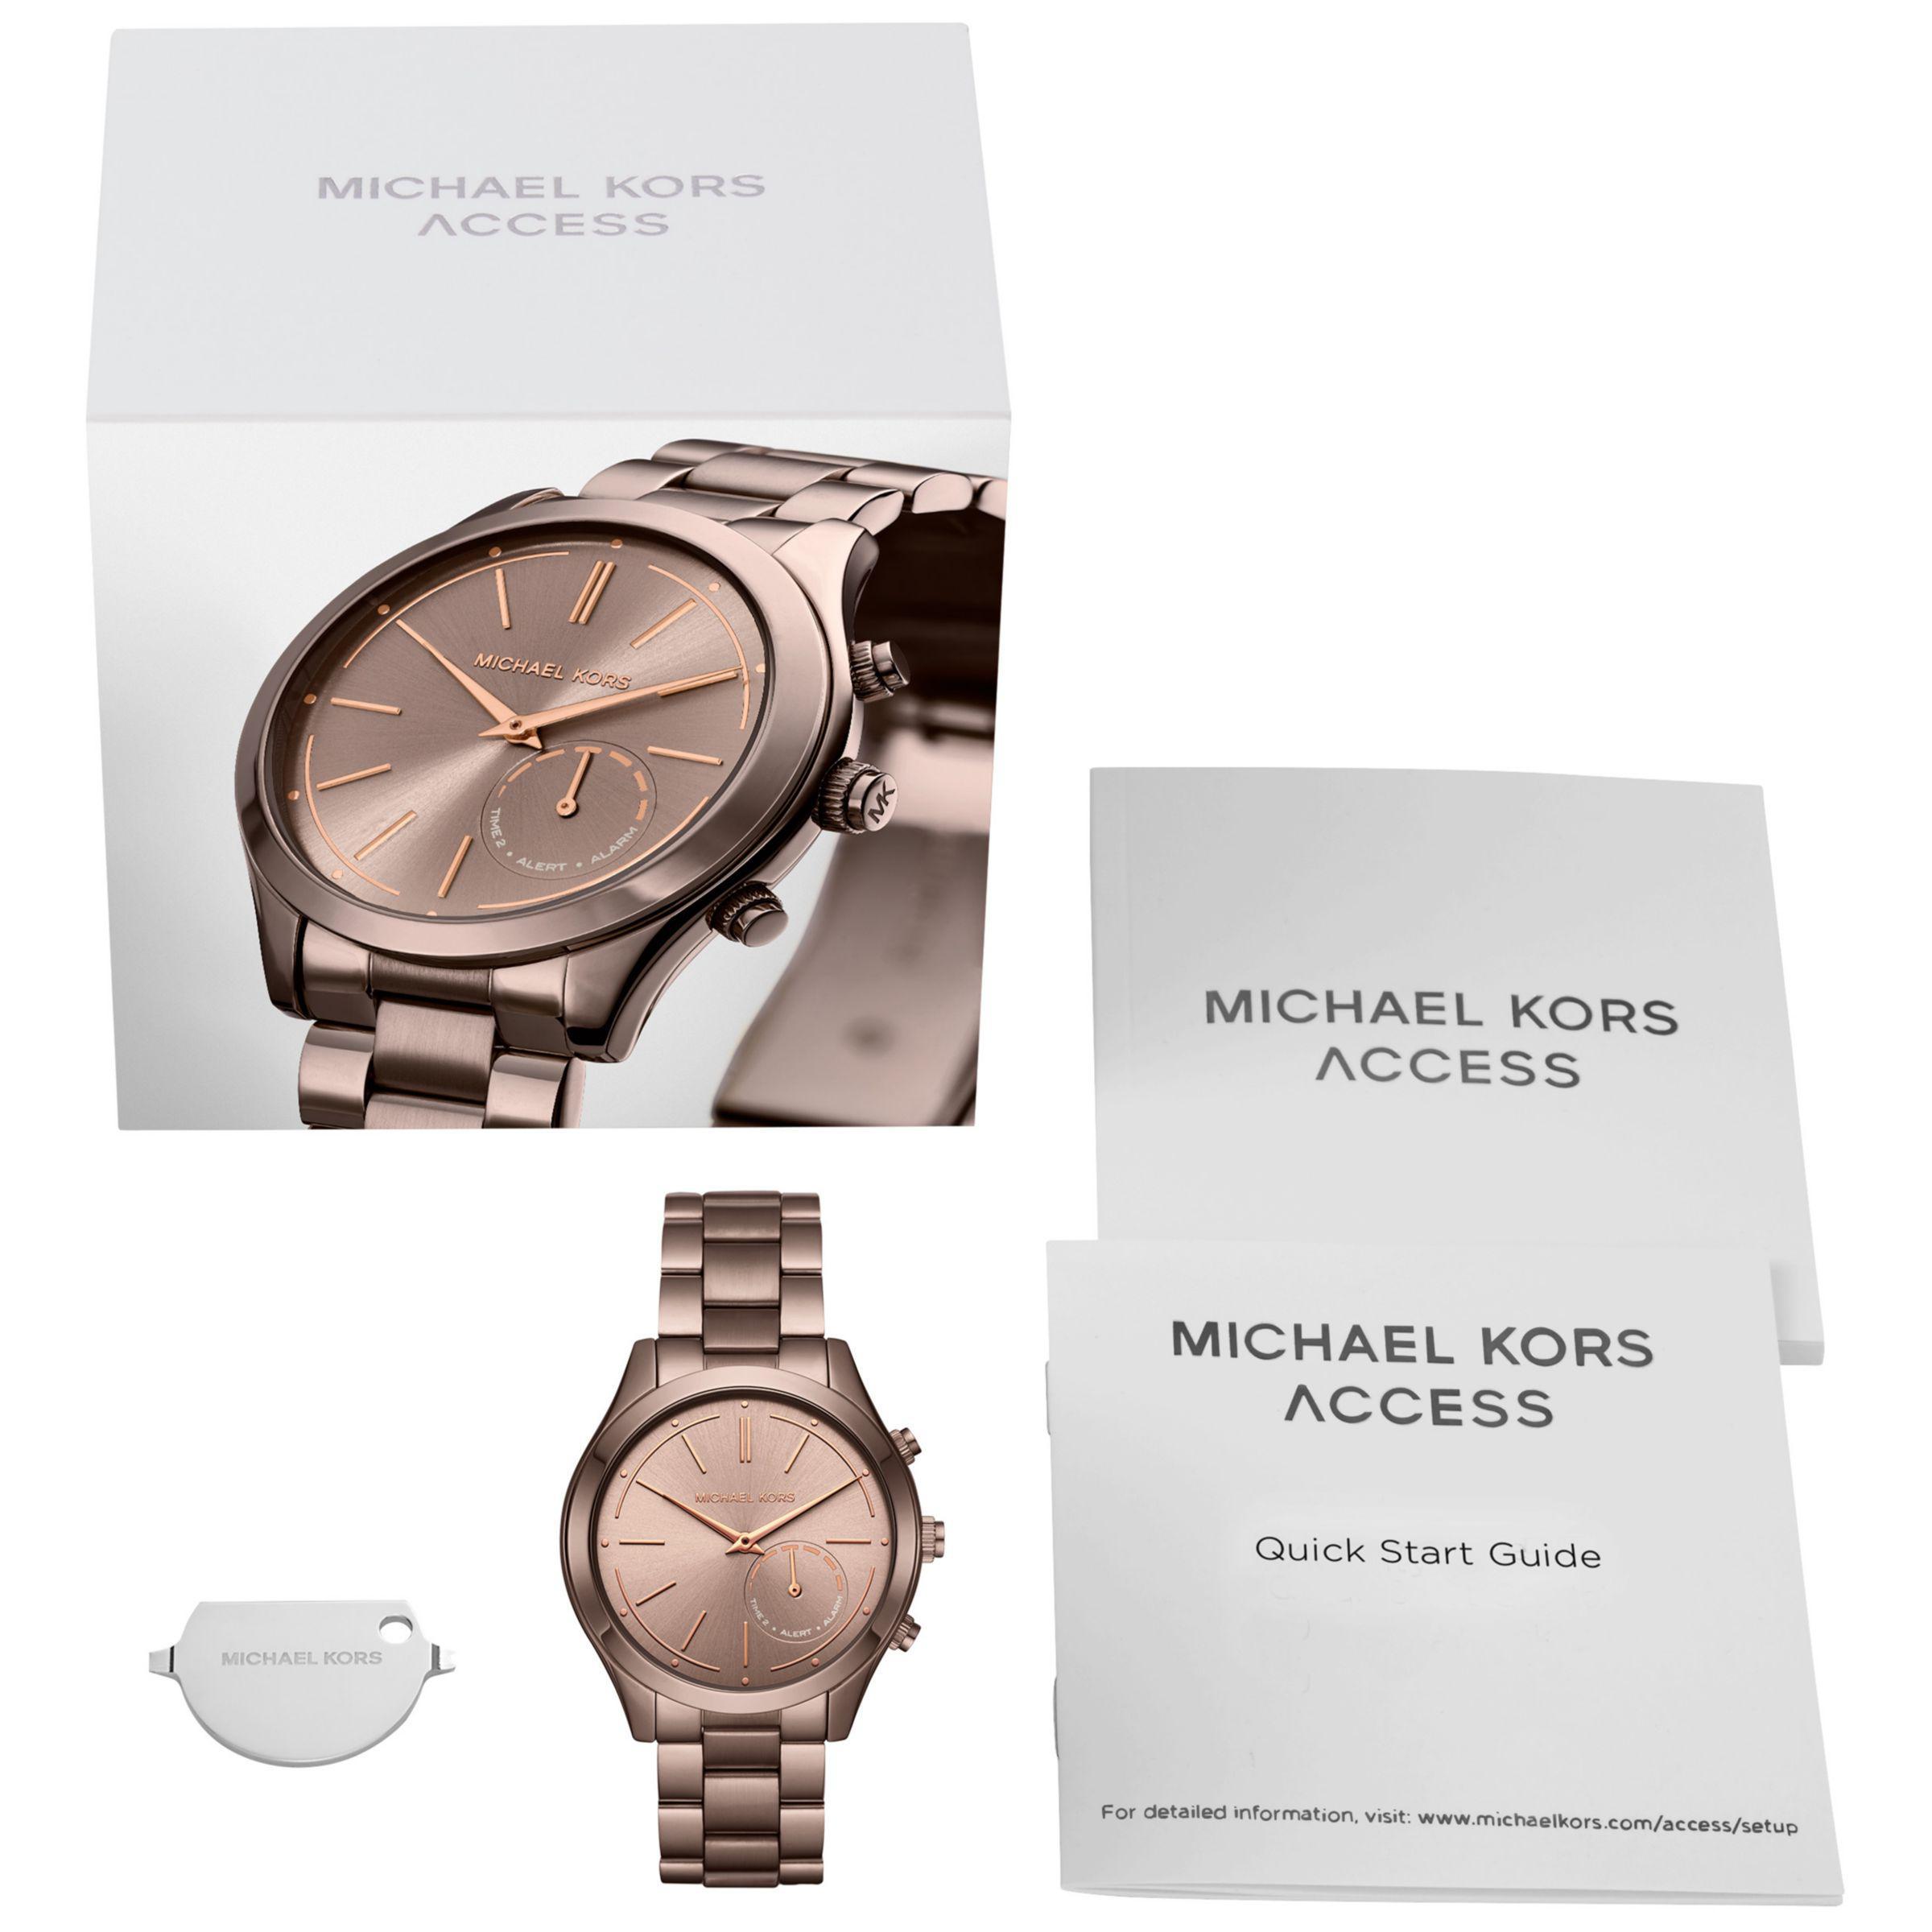 51cdb7ba4 Michael Kors Access Women's Slim Runway Bracelet Strap Hybrid ...